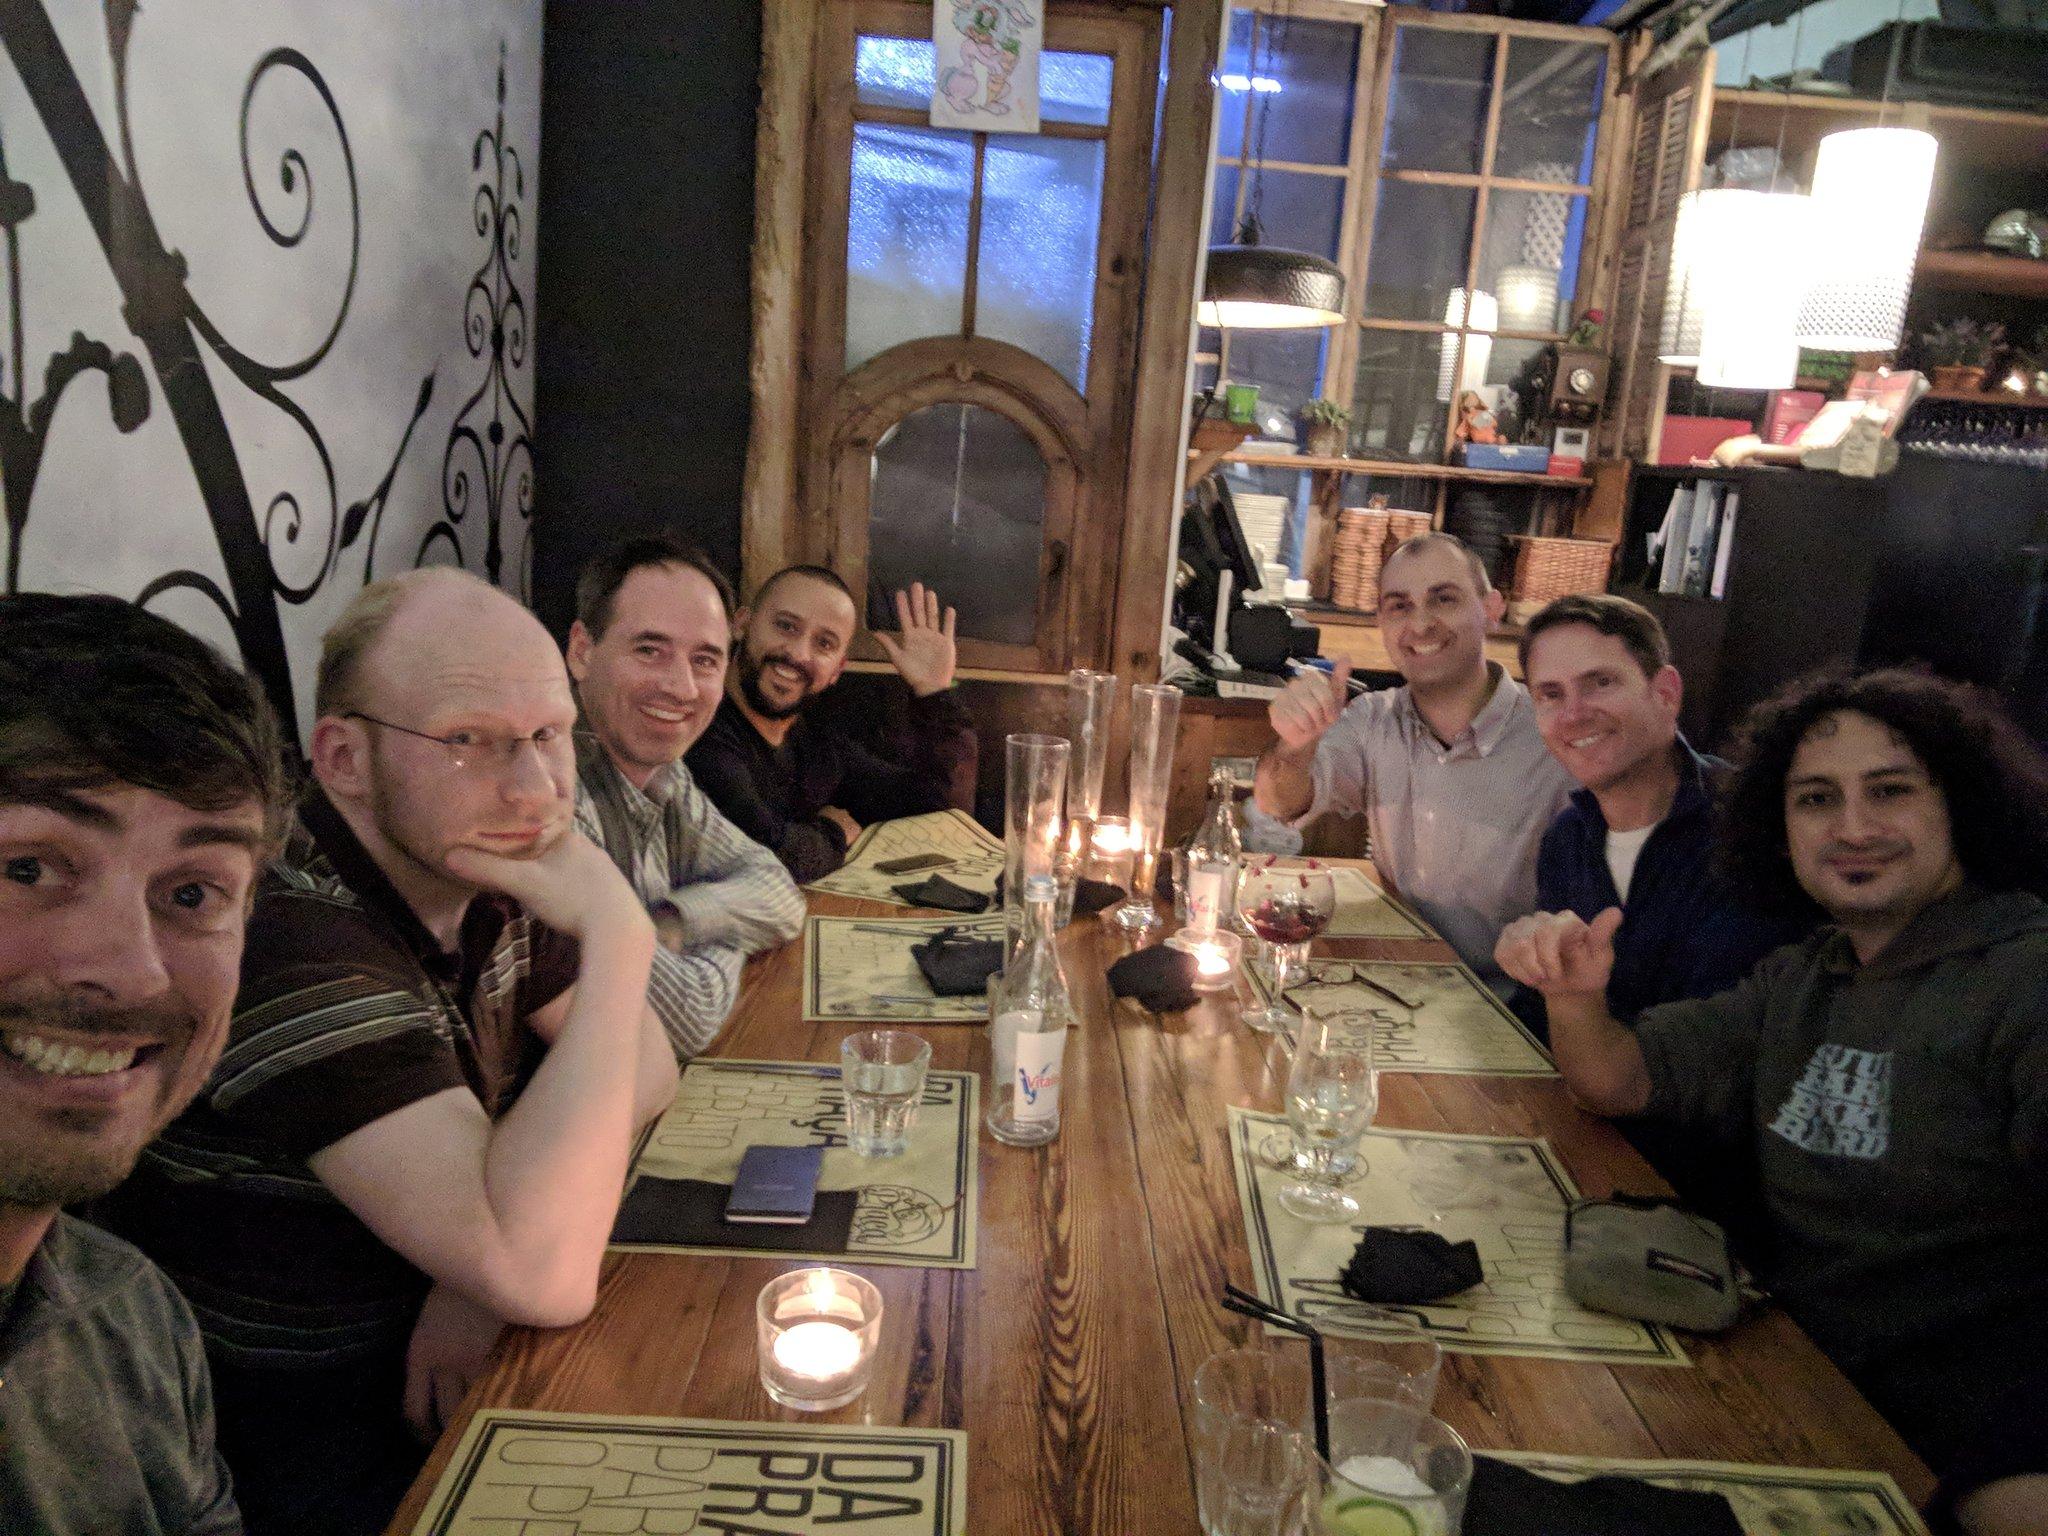 Nathan McMinn ,  Axel Faust ,  Jim Toronto , Luis Cabaceira , PJ,  Jeff Potts  and  Boriss Mejias .  Thanks  Nathan for this epic shot!